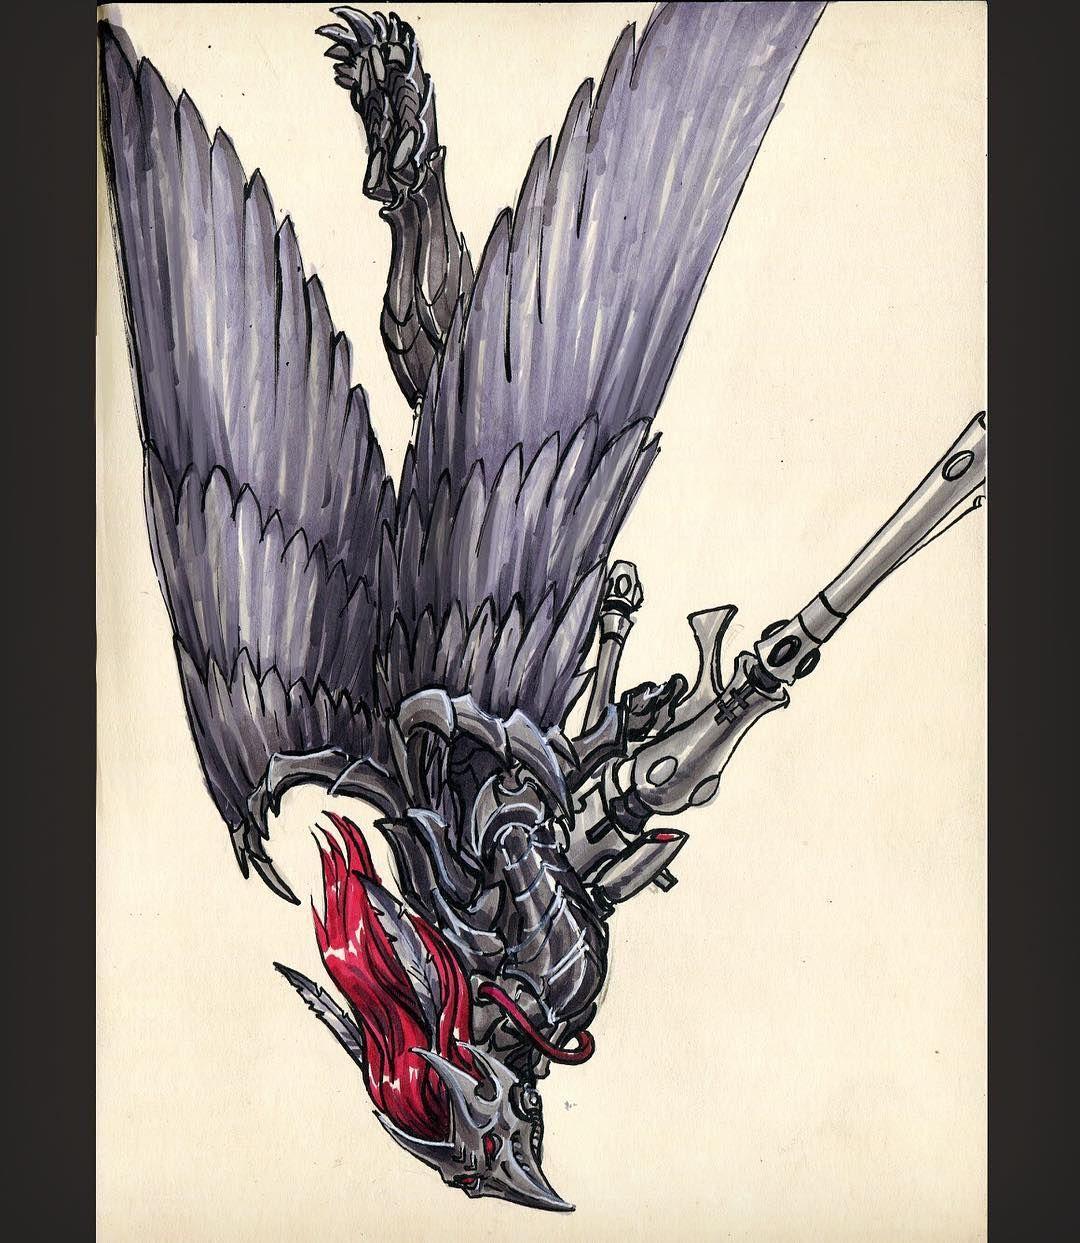 Pin By Sok On Eldar Inktober Pinterest Warhammer 40k Art Dark